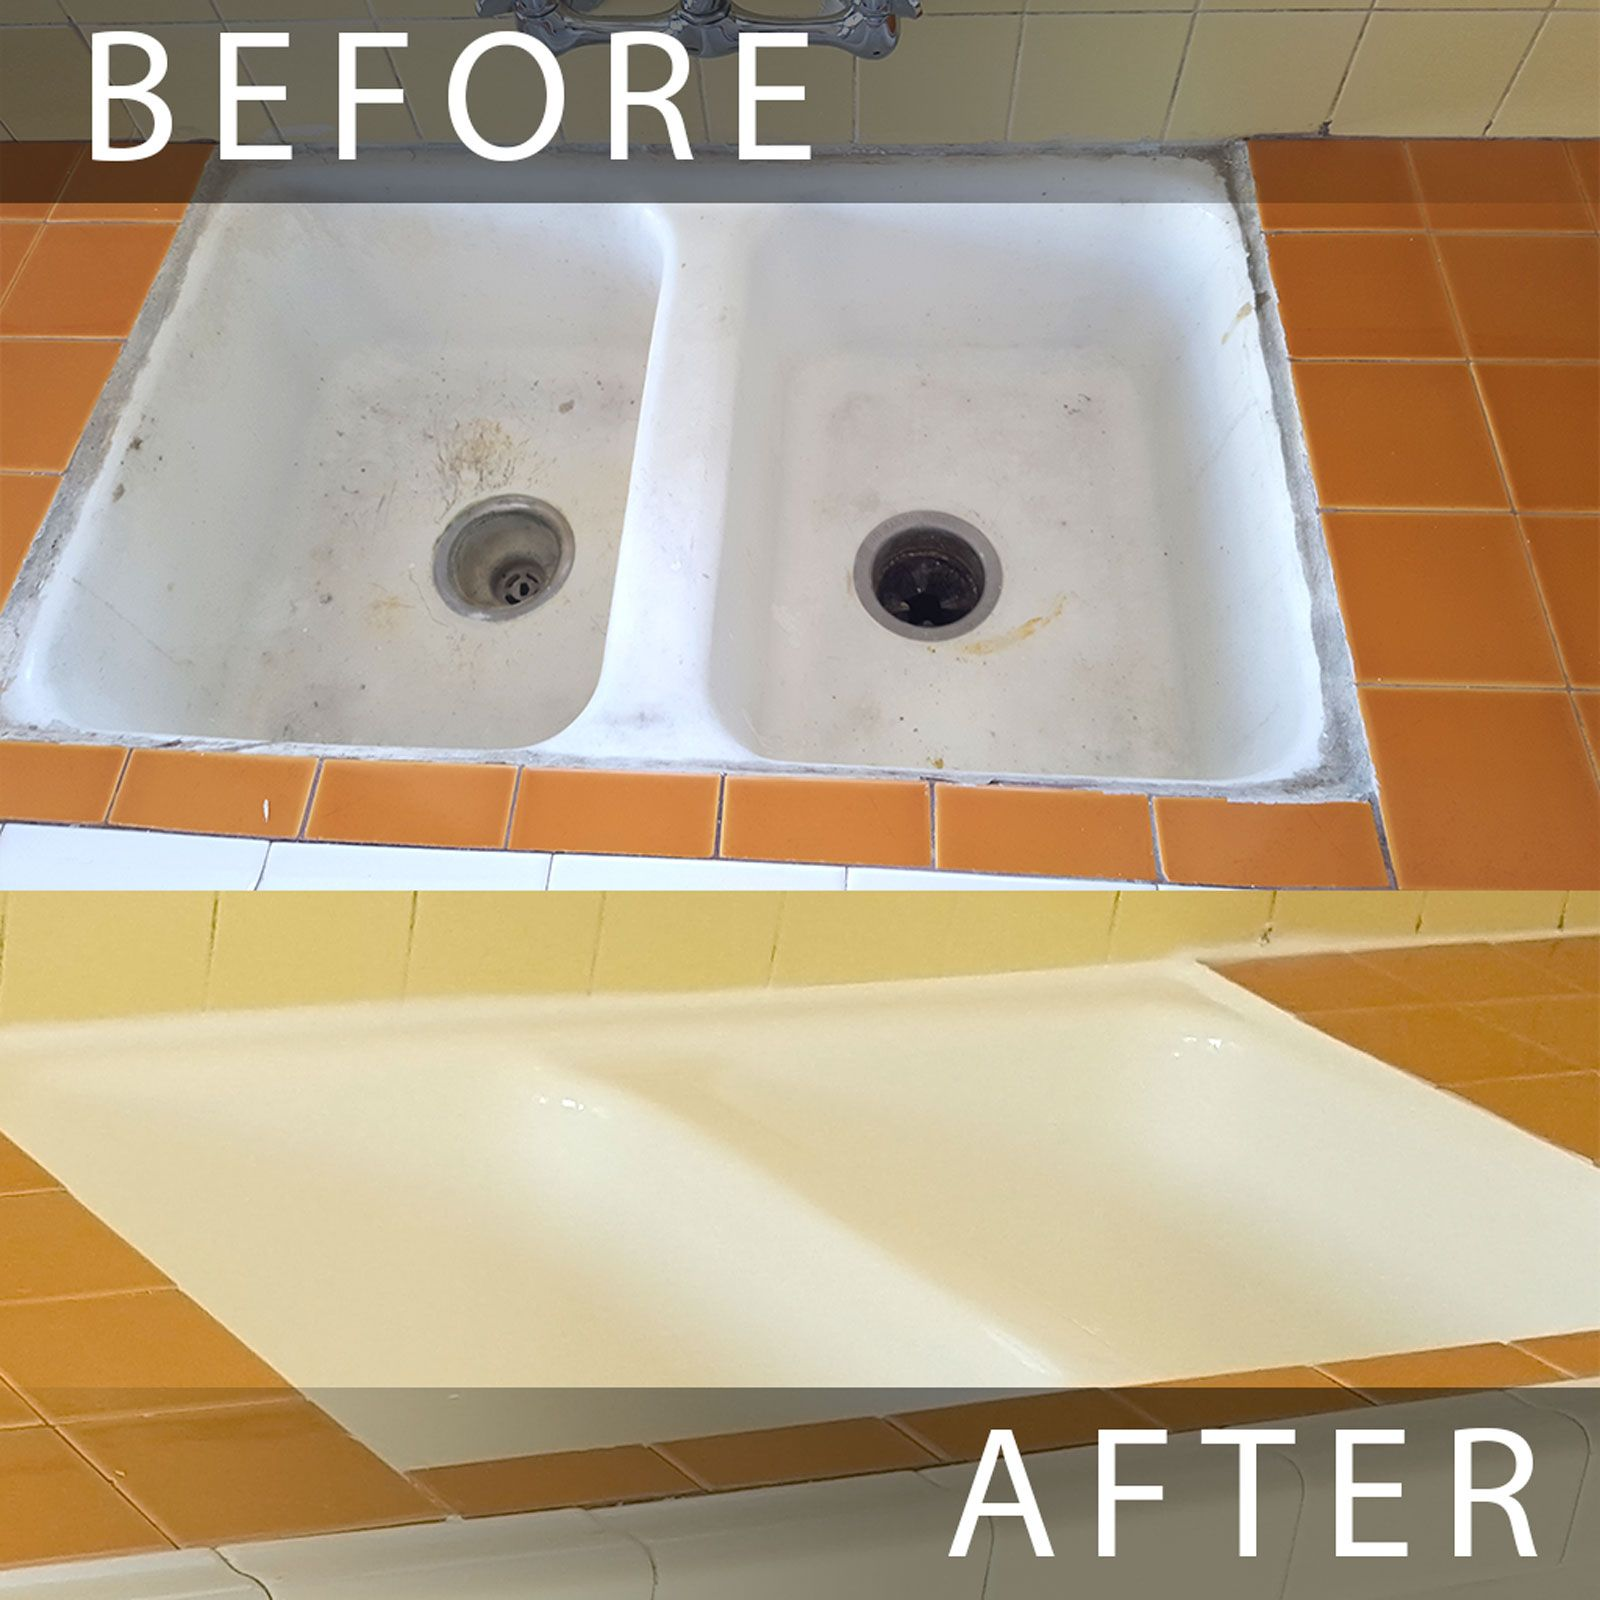 Best Kitchen Gallery: Kitchen Sink Reglazing Los Angeles Before And After Sink Reglazed of Reglazing Kitchen Sinks on rachelxblog.com